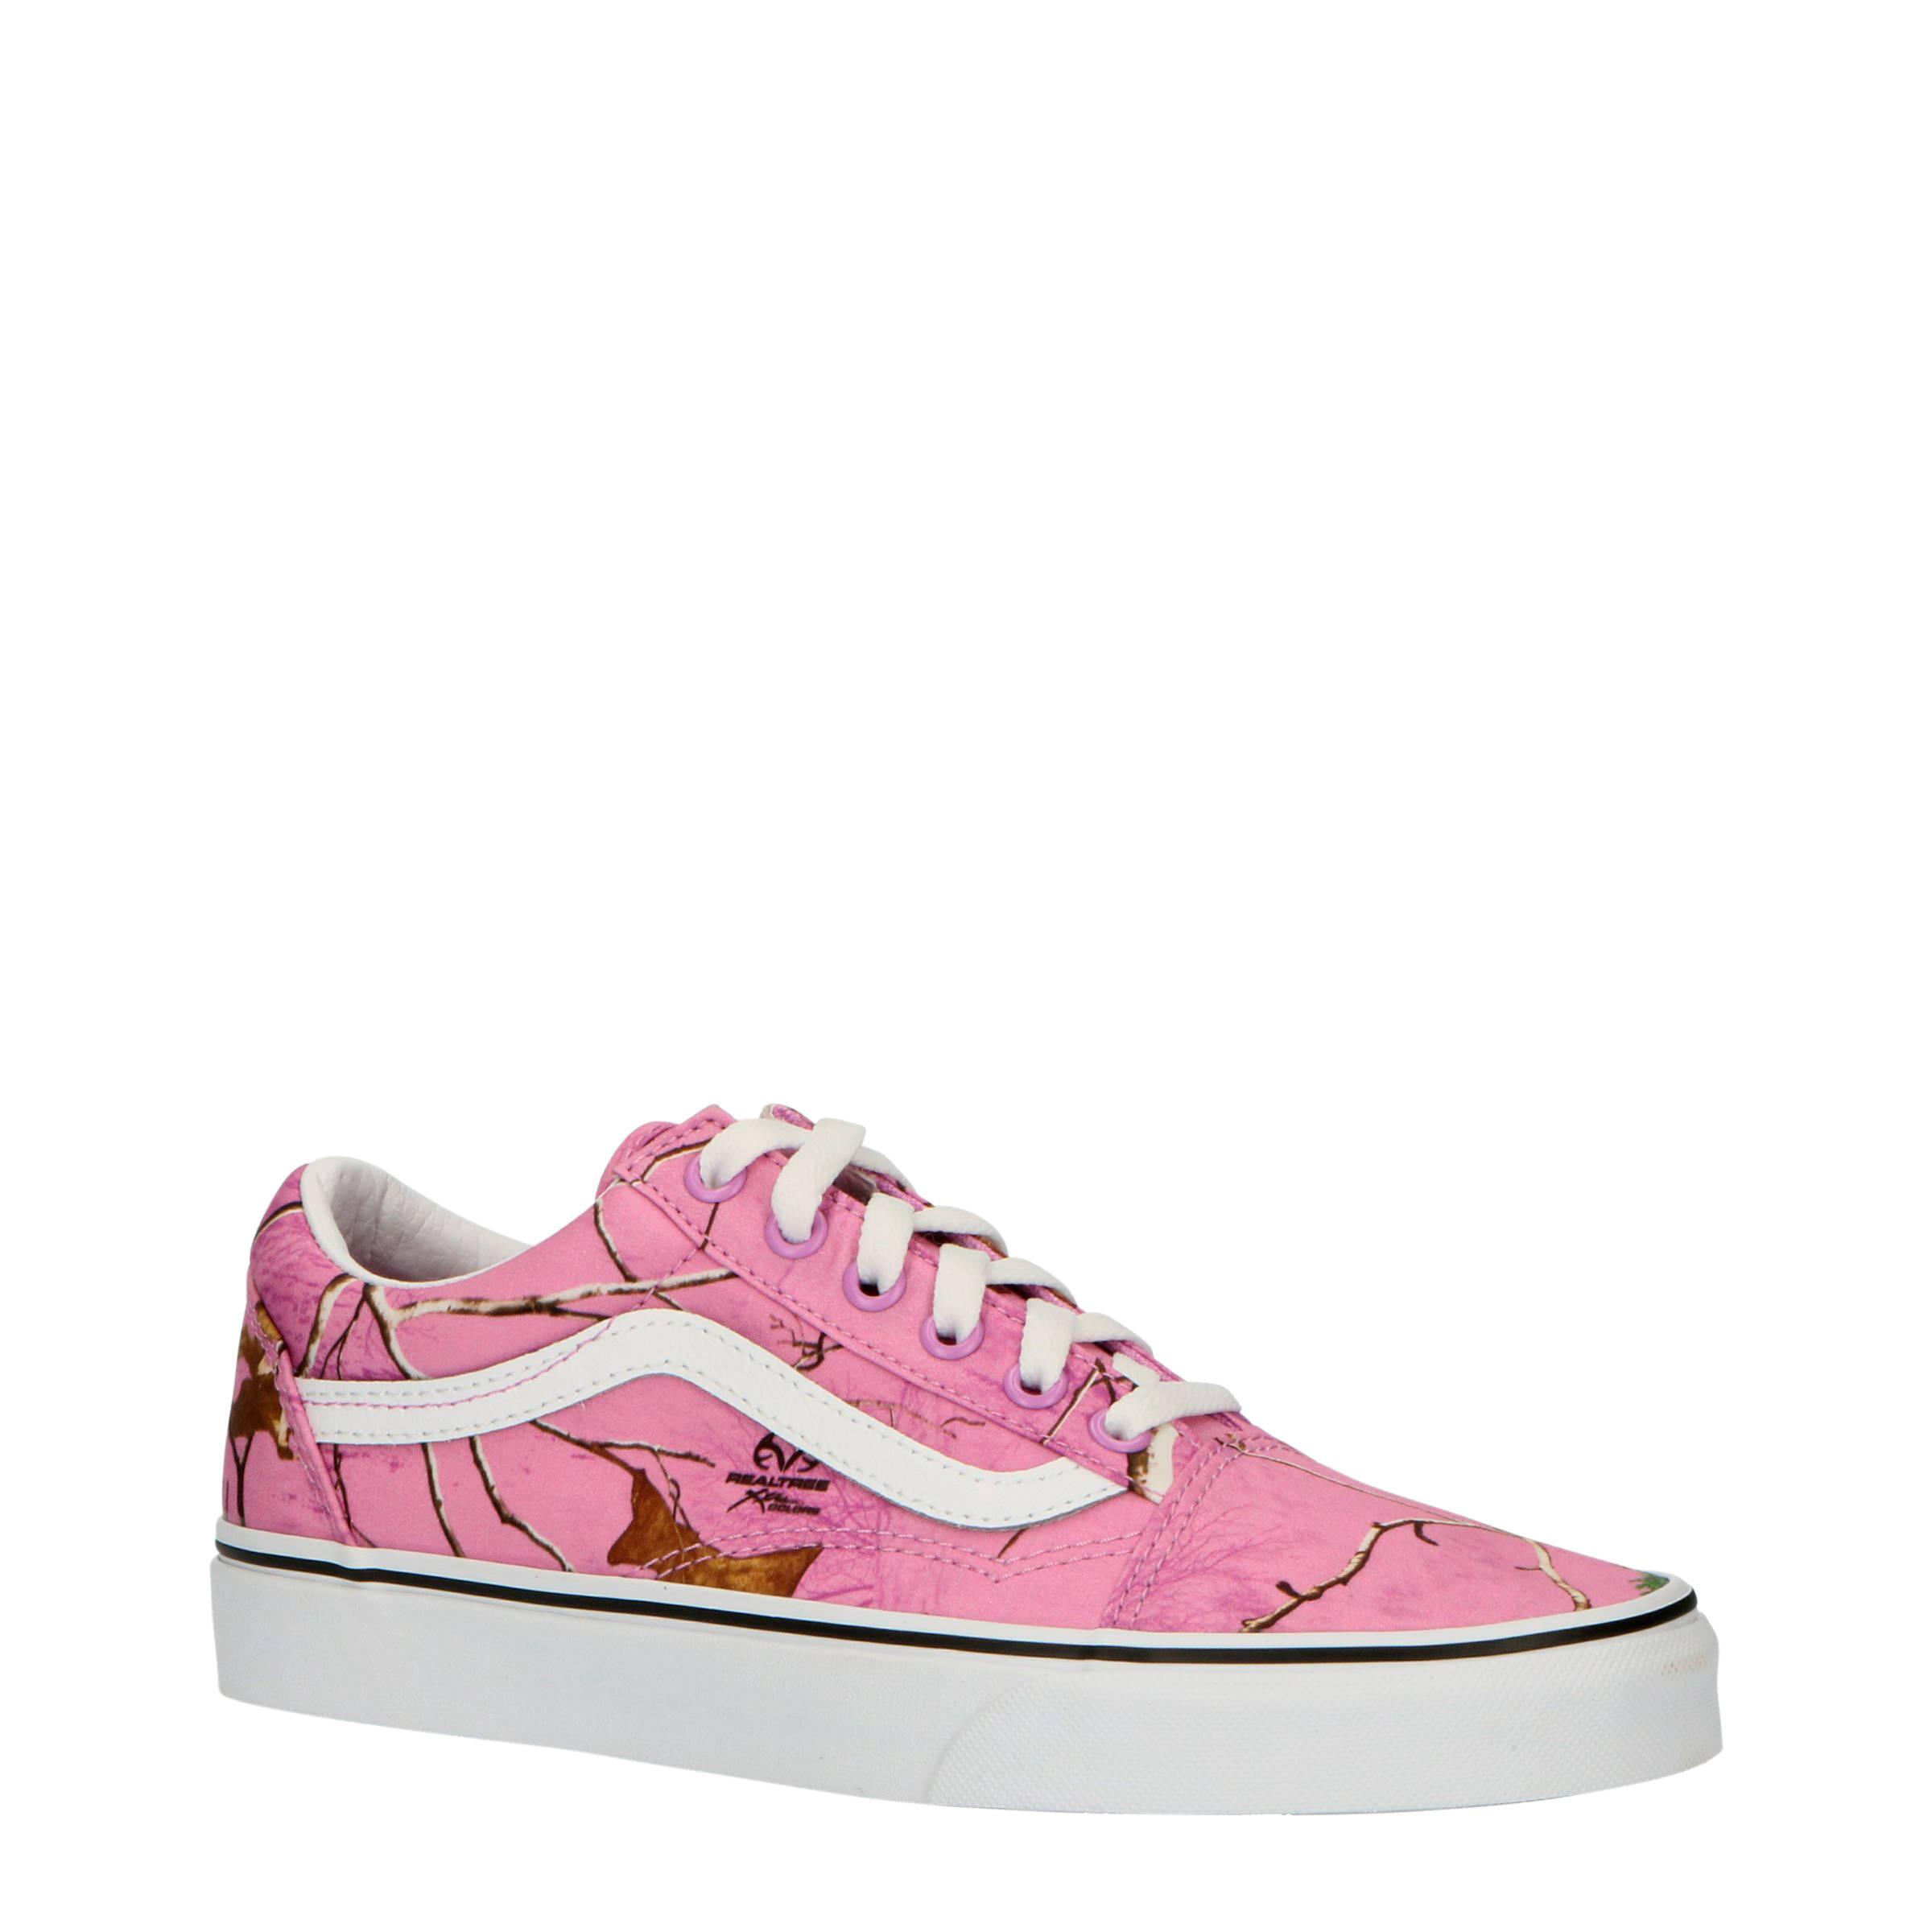 Vans Old Skool Oudroze Dames 59,95 sneakers.nl | Oudroze